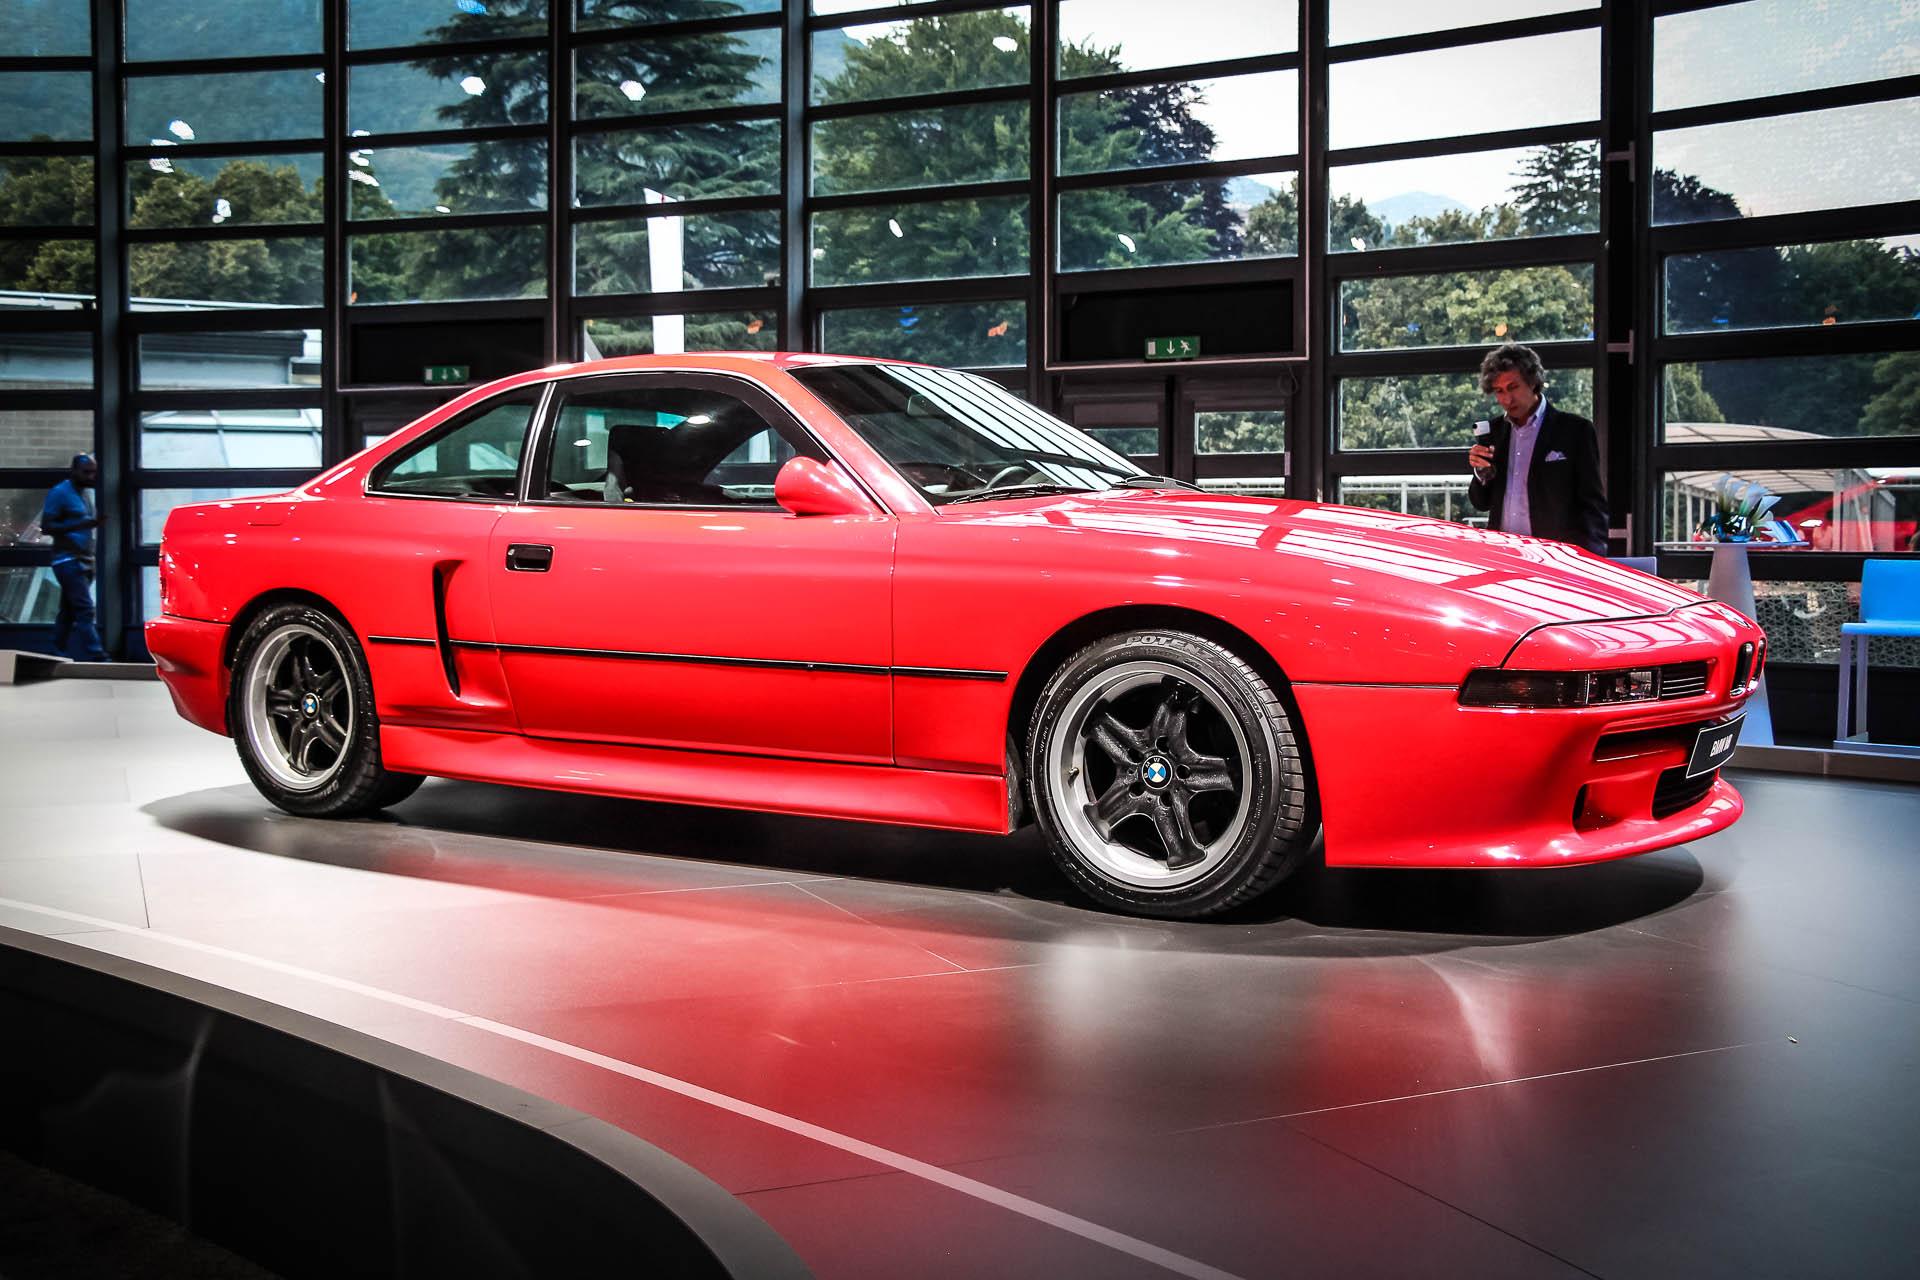 BMW Concept 8 Series основан на платформе новой 5 Series.